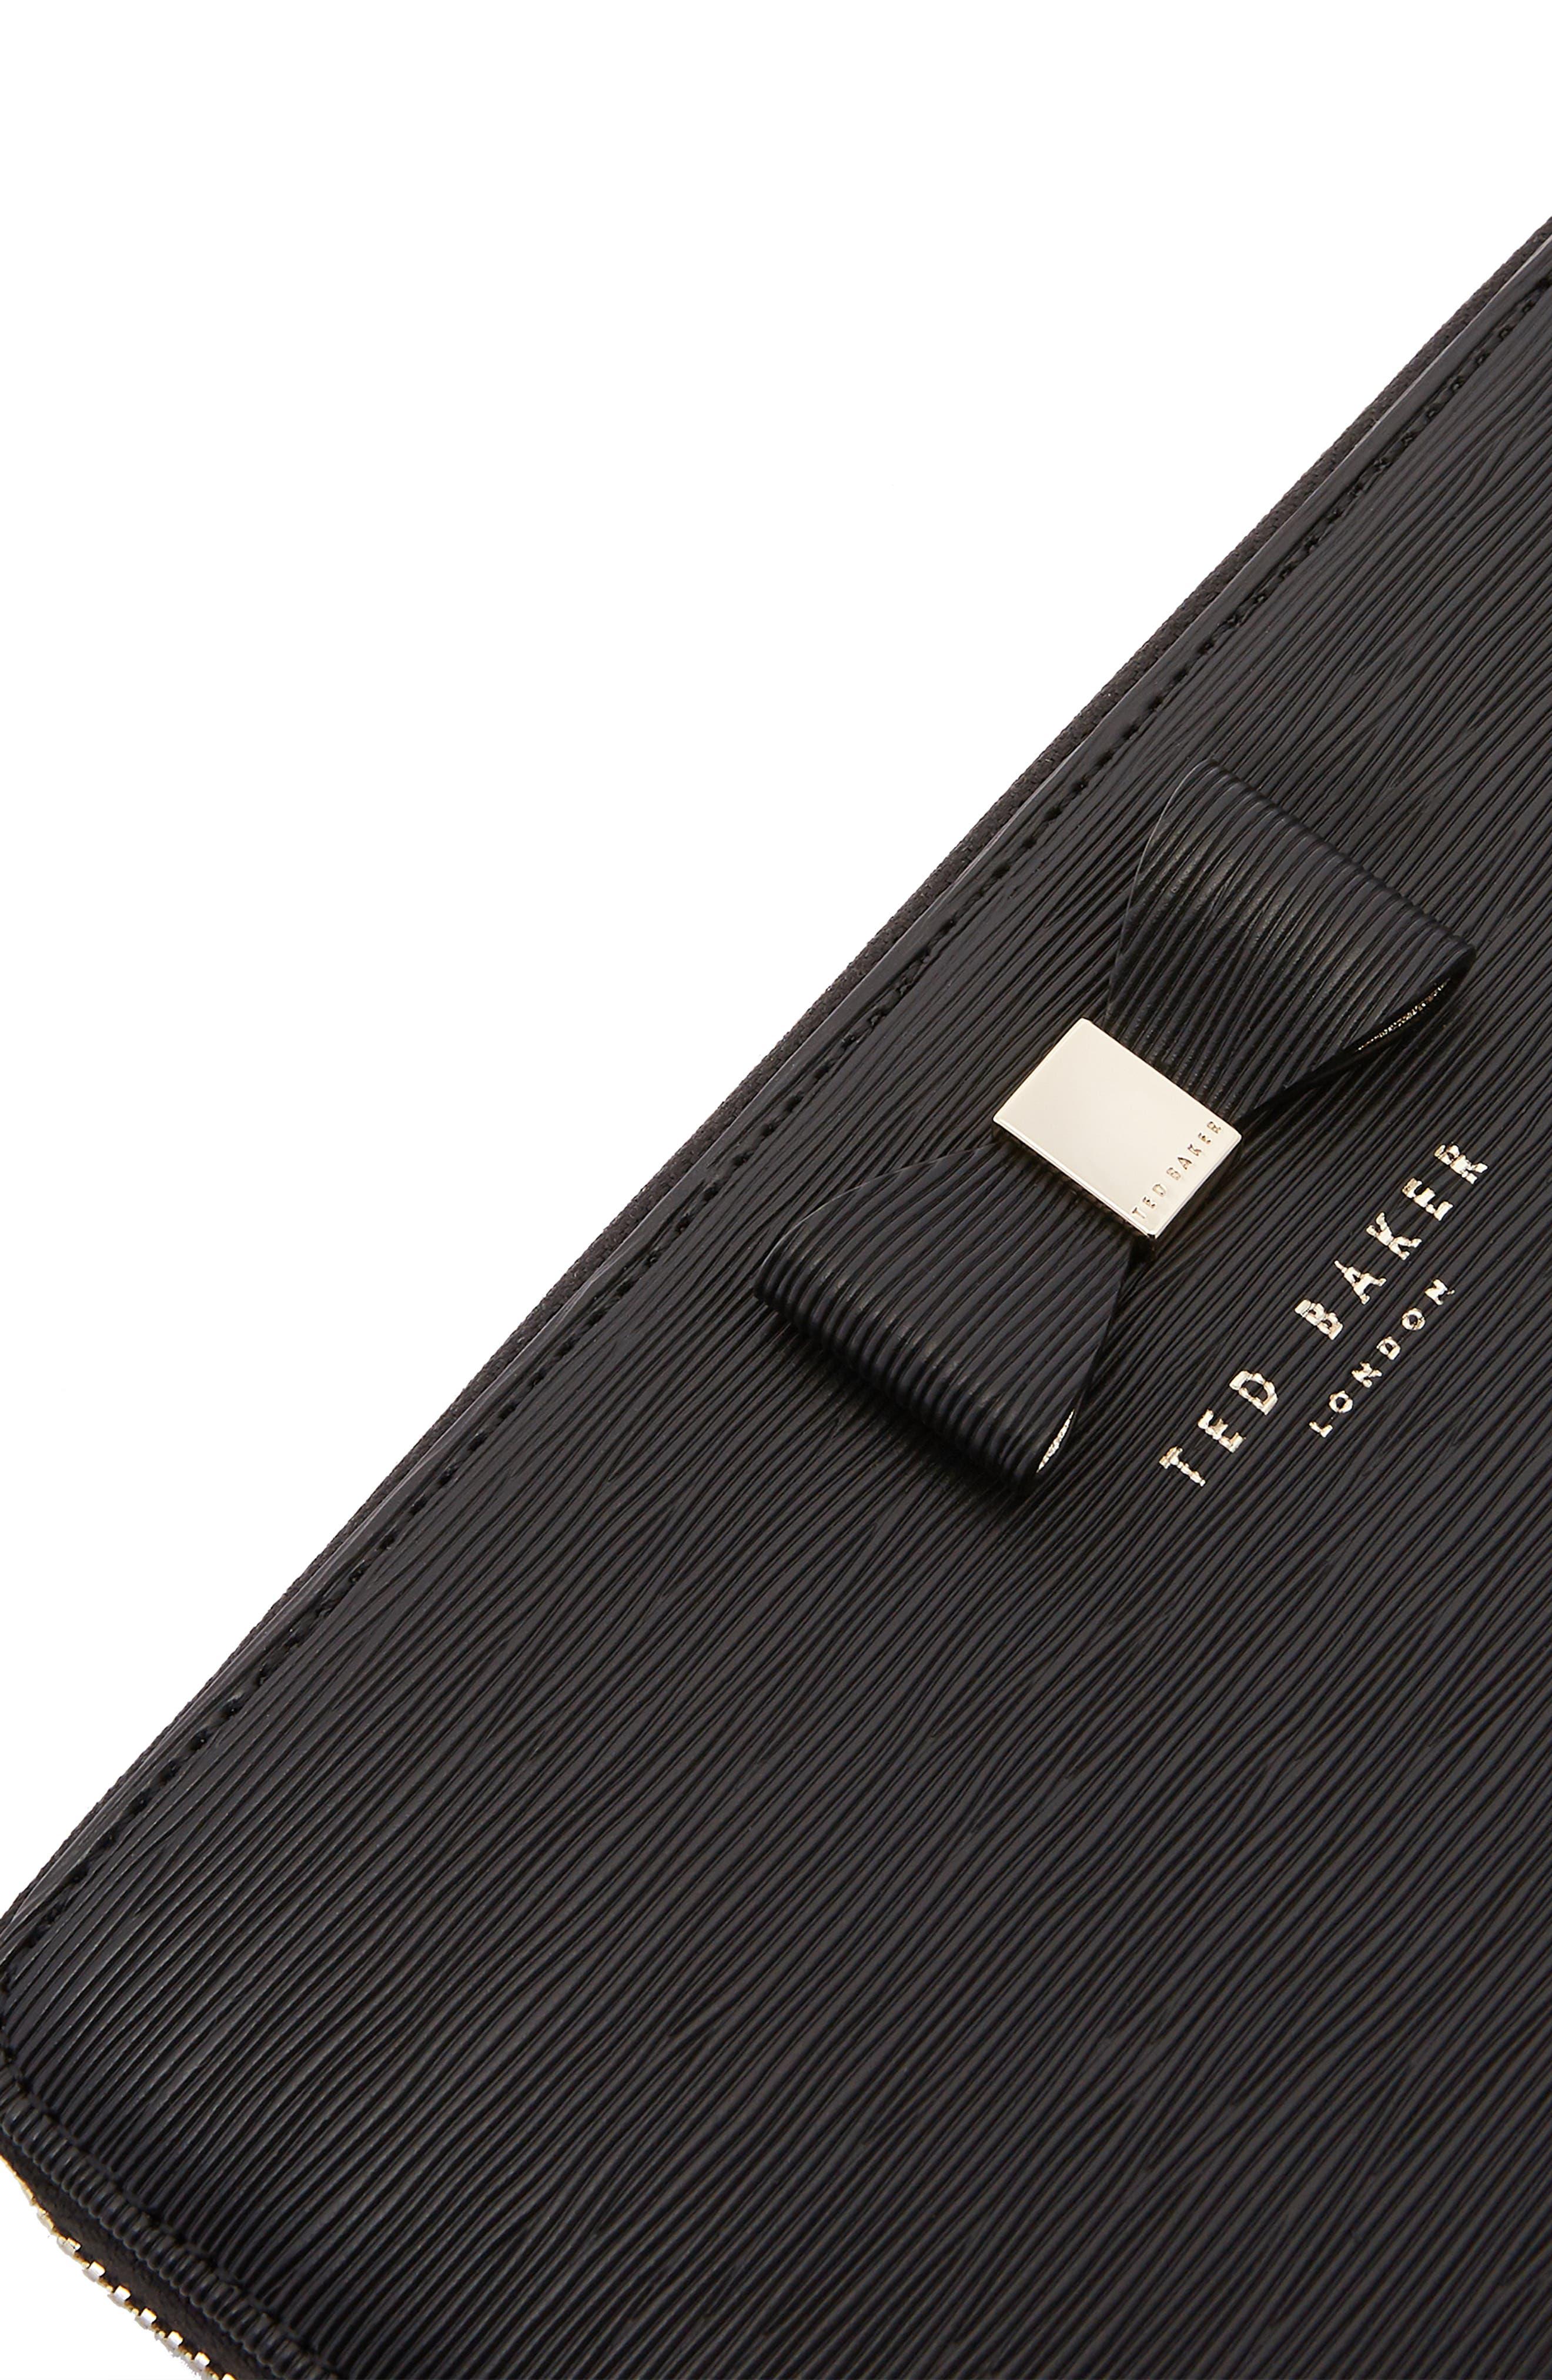 Peony Plissé Leather Matinee Wallet,                             Alternate thumbnail 4, color,                             001